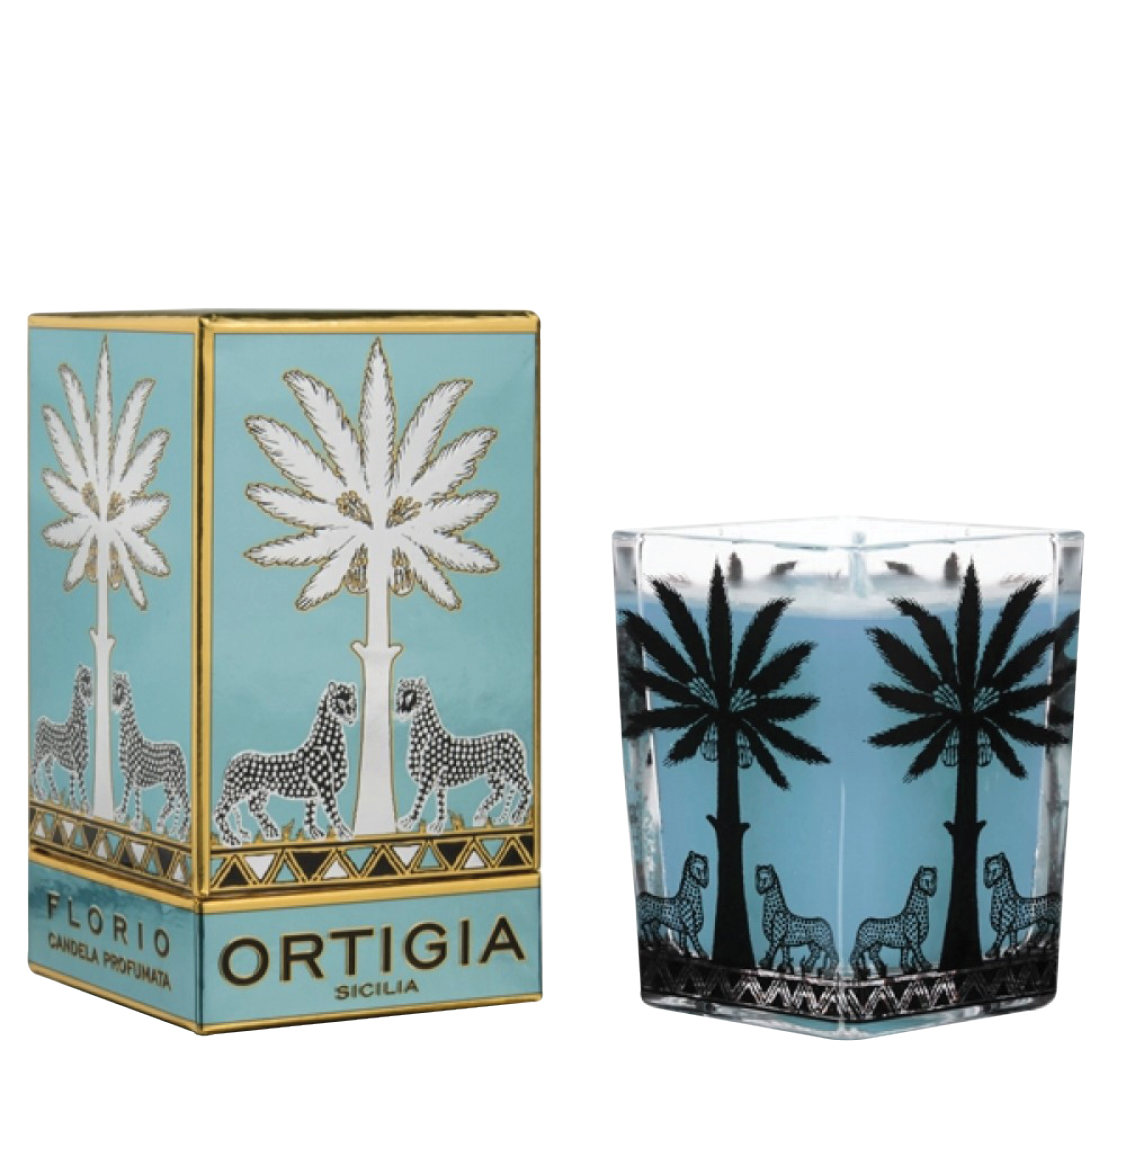 Ortigia_Sicilia_Florio_Large_Square_Candle_The_Project_Garments_A